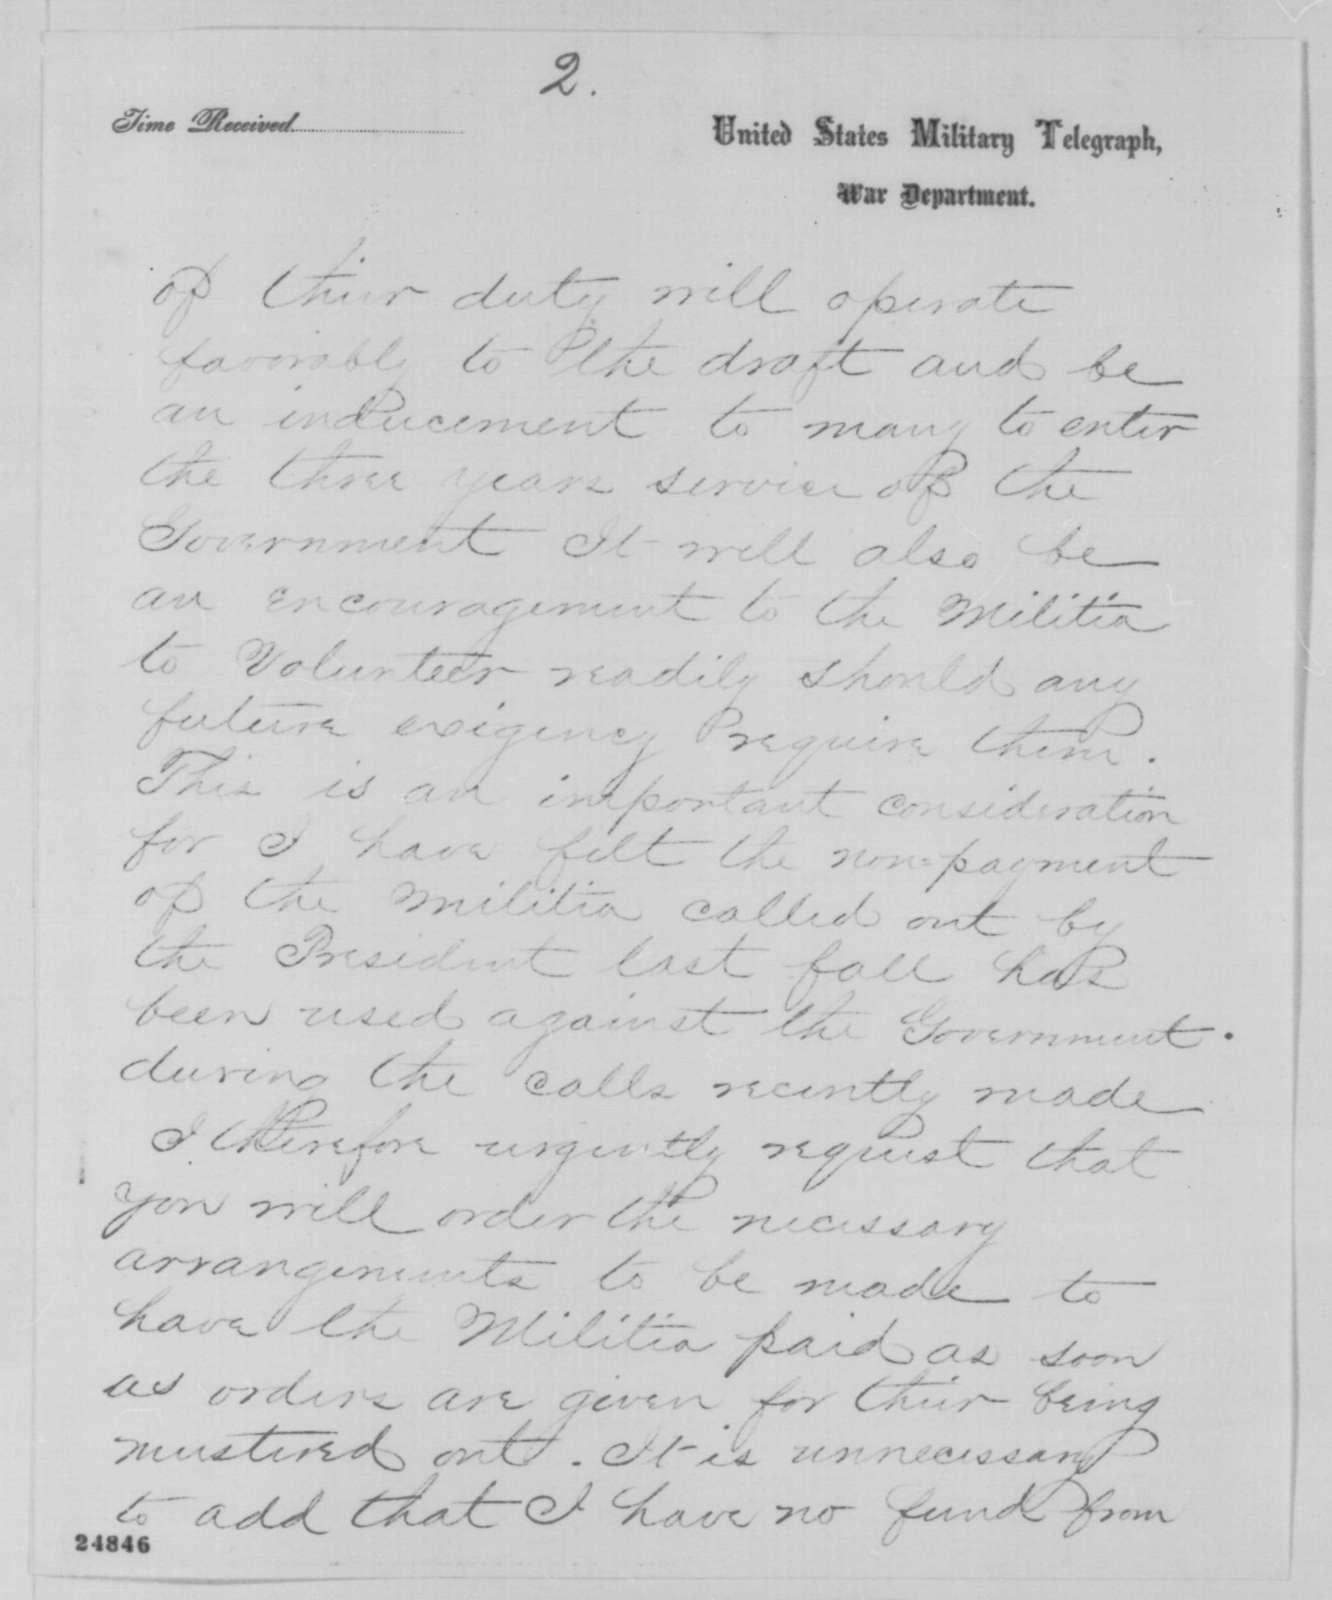 Andrew G. Curtin to Edwin M. Stanton, Wednesday, July 15, 1863  (Telegram concerning Pennsylvania militia)